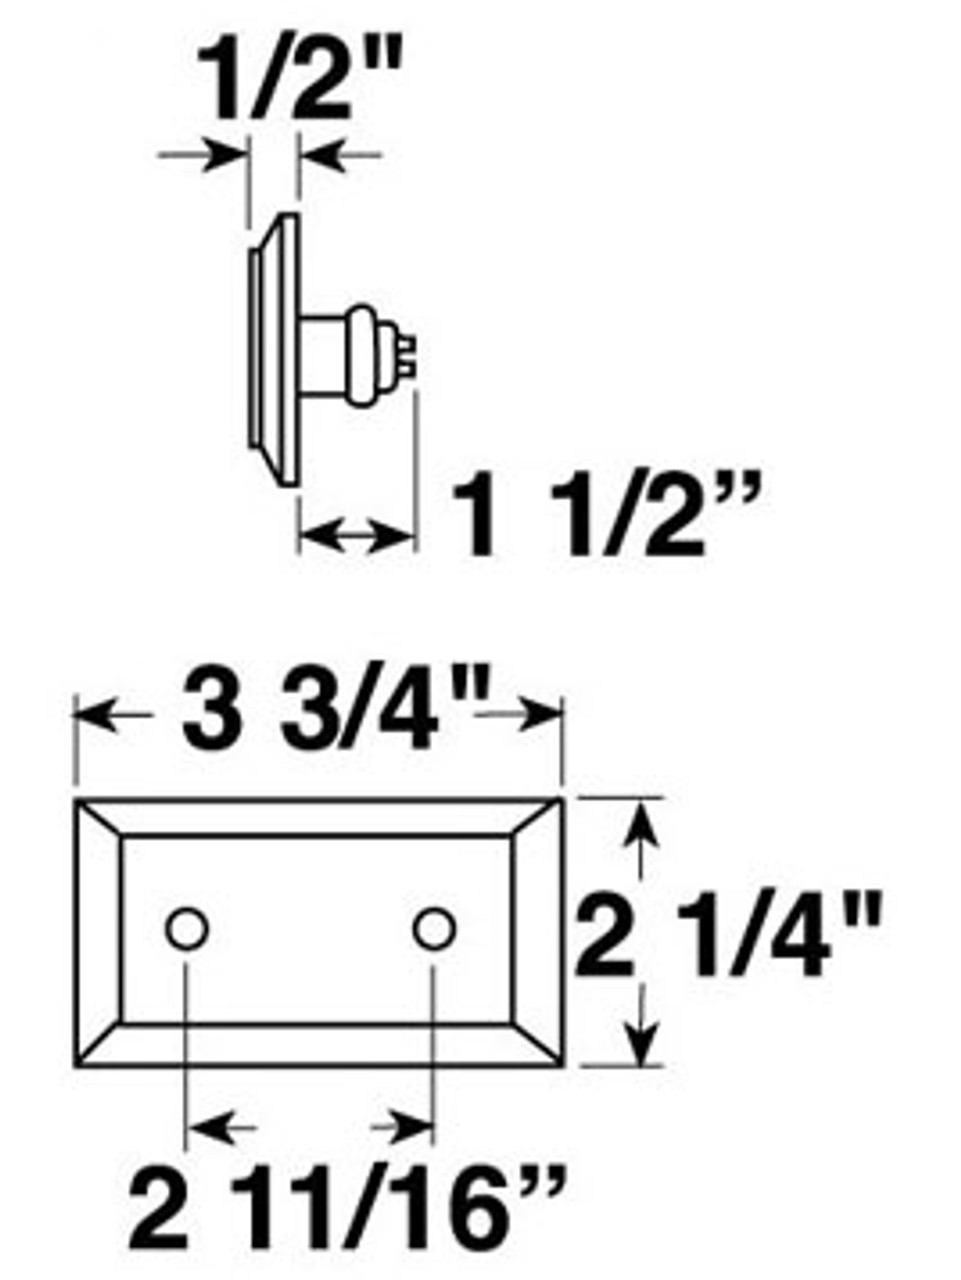 V126A --- Rectangular Chrome Plated Clearance/Side Marker Light